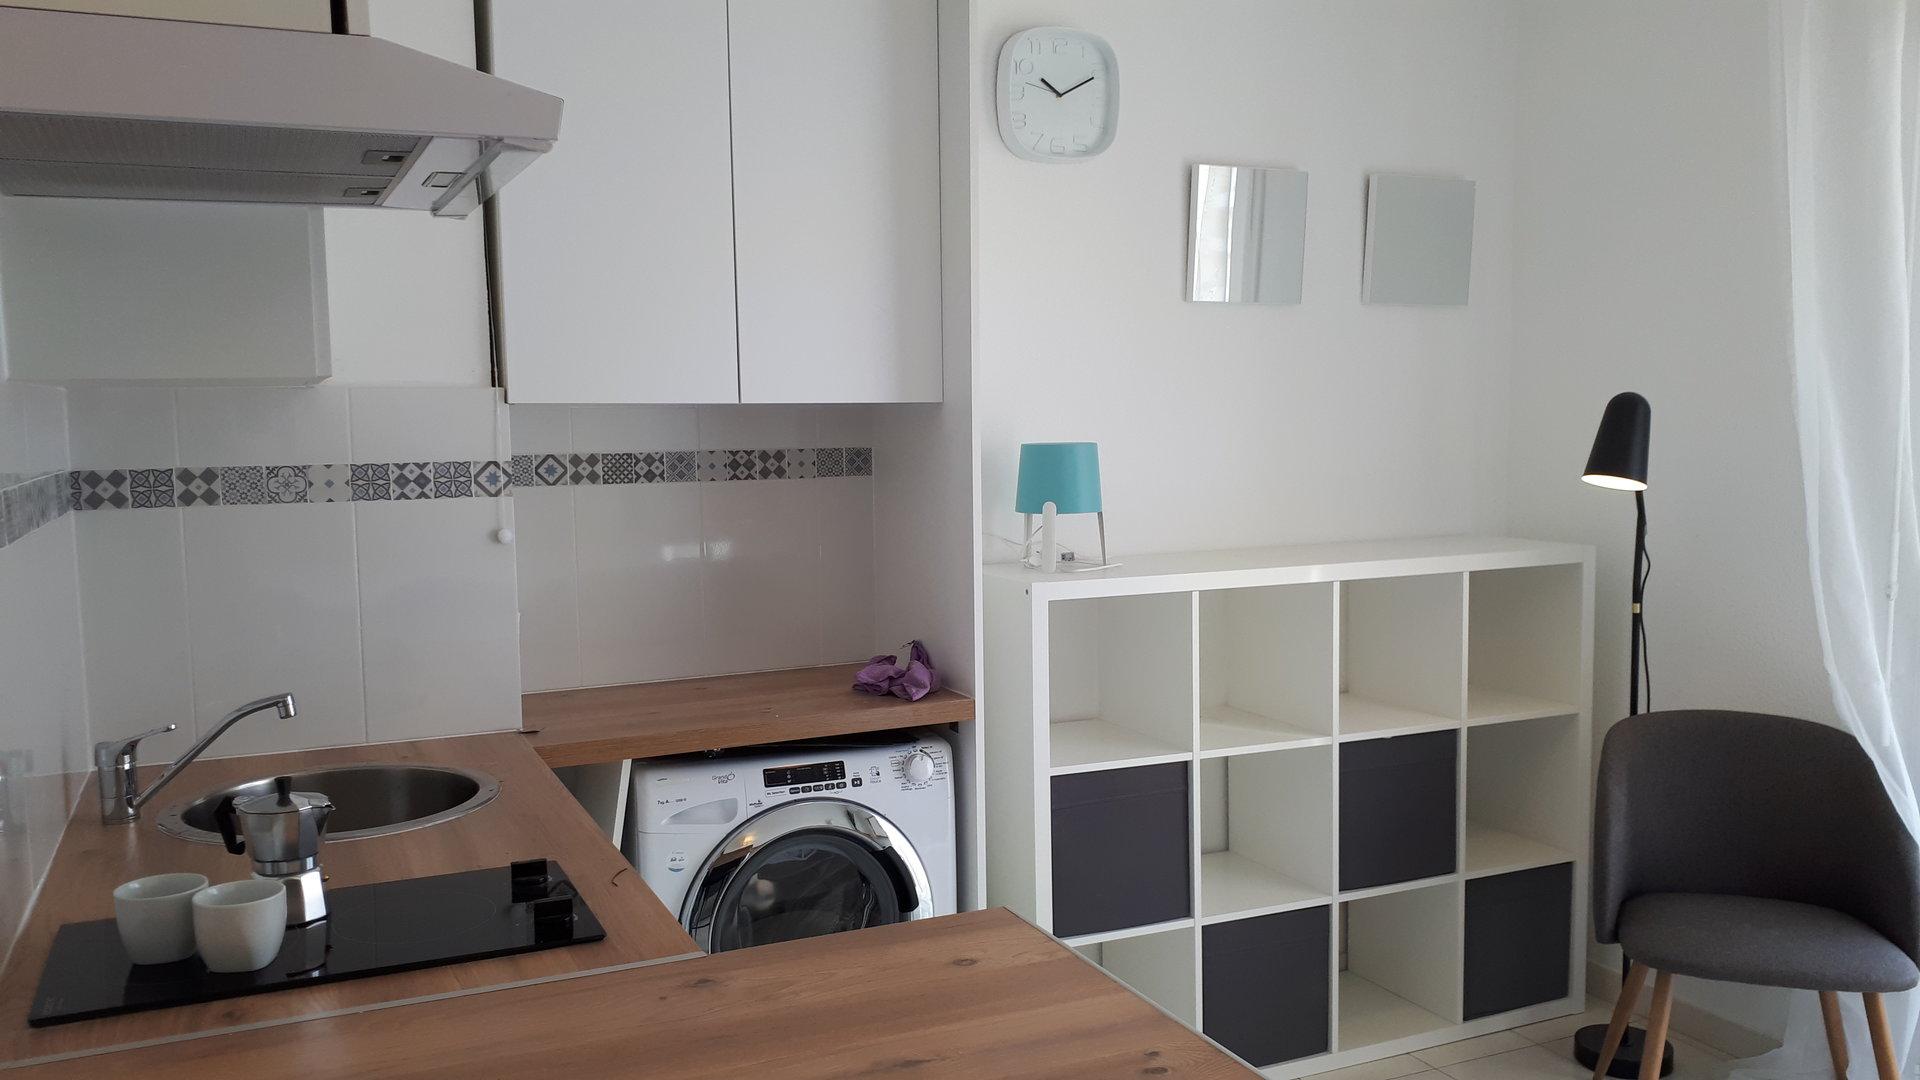 Affitto Appartamento - Nizza (Nice) Saint Jean d'Angély